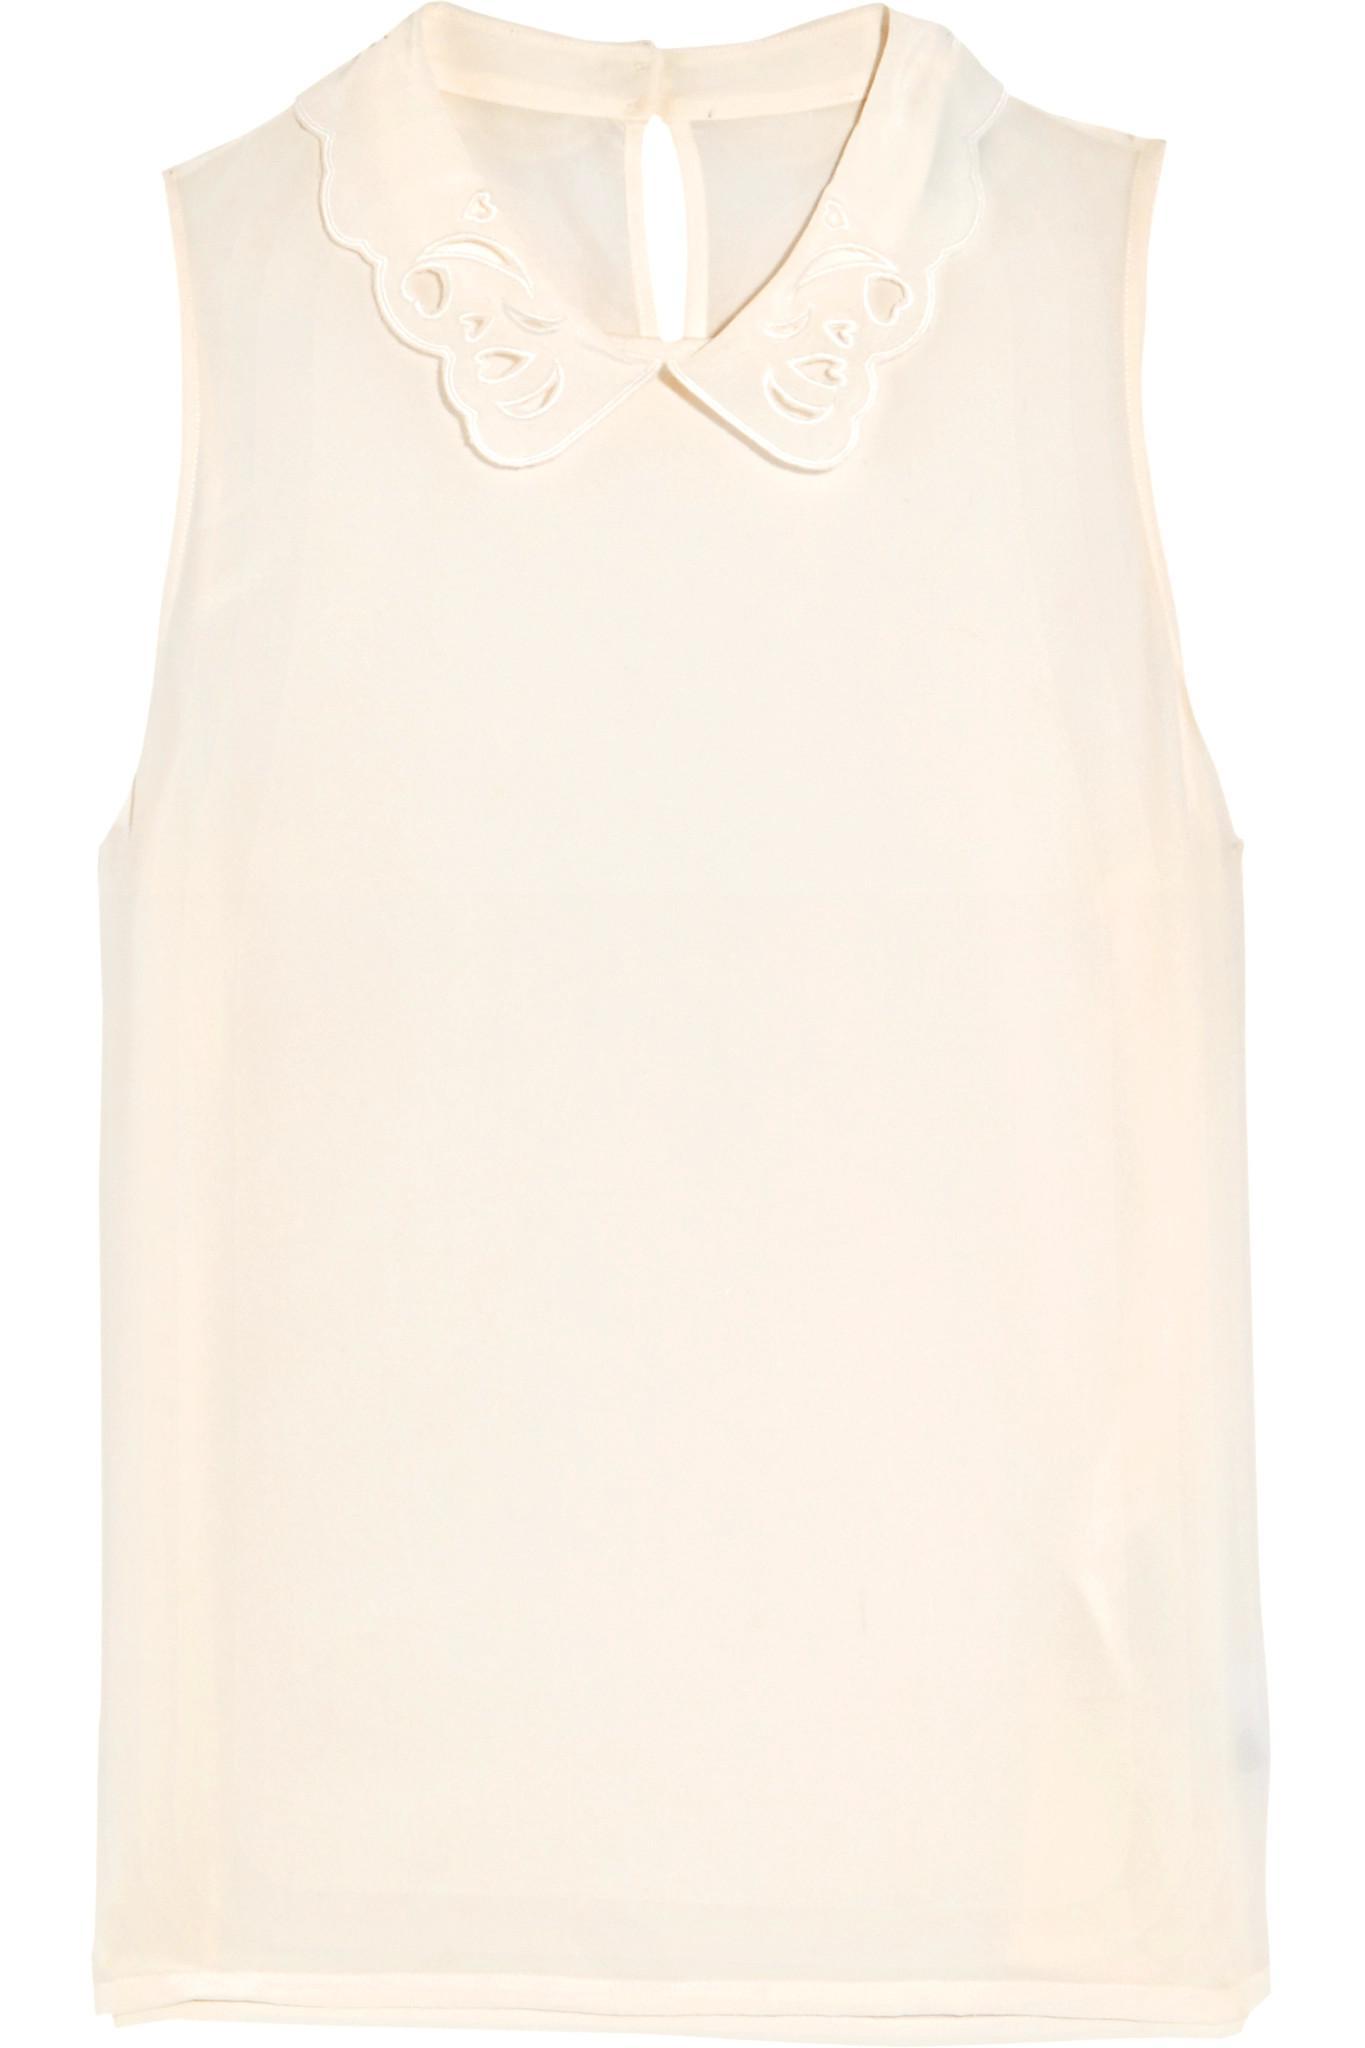 Maje Woman Ruffled Point Desprit-paneled Silk-chiffon Top White Size 1 Maje Cheap Wiki VG1Dn6BSj